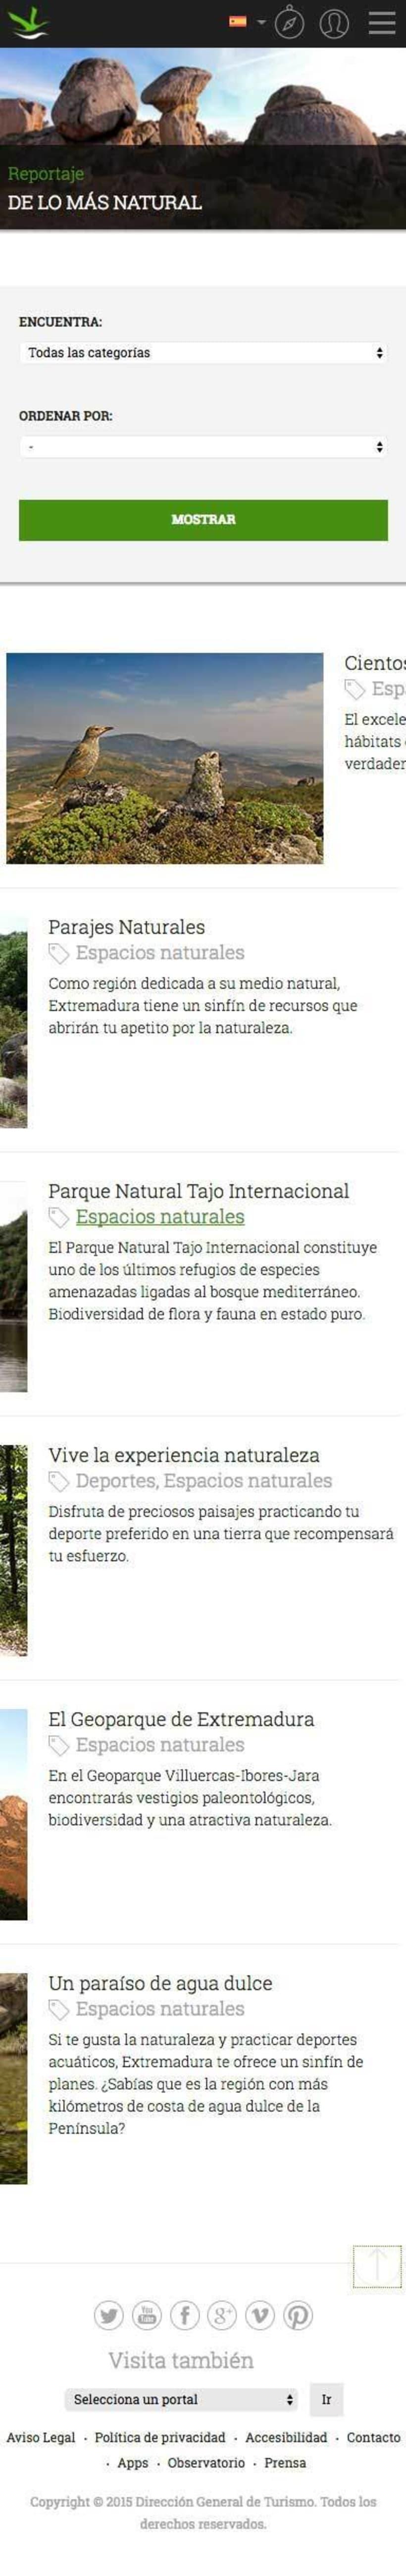 Turismo Extremadura 1